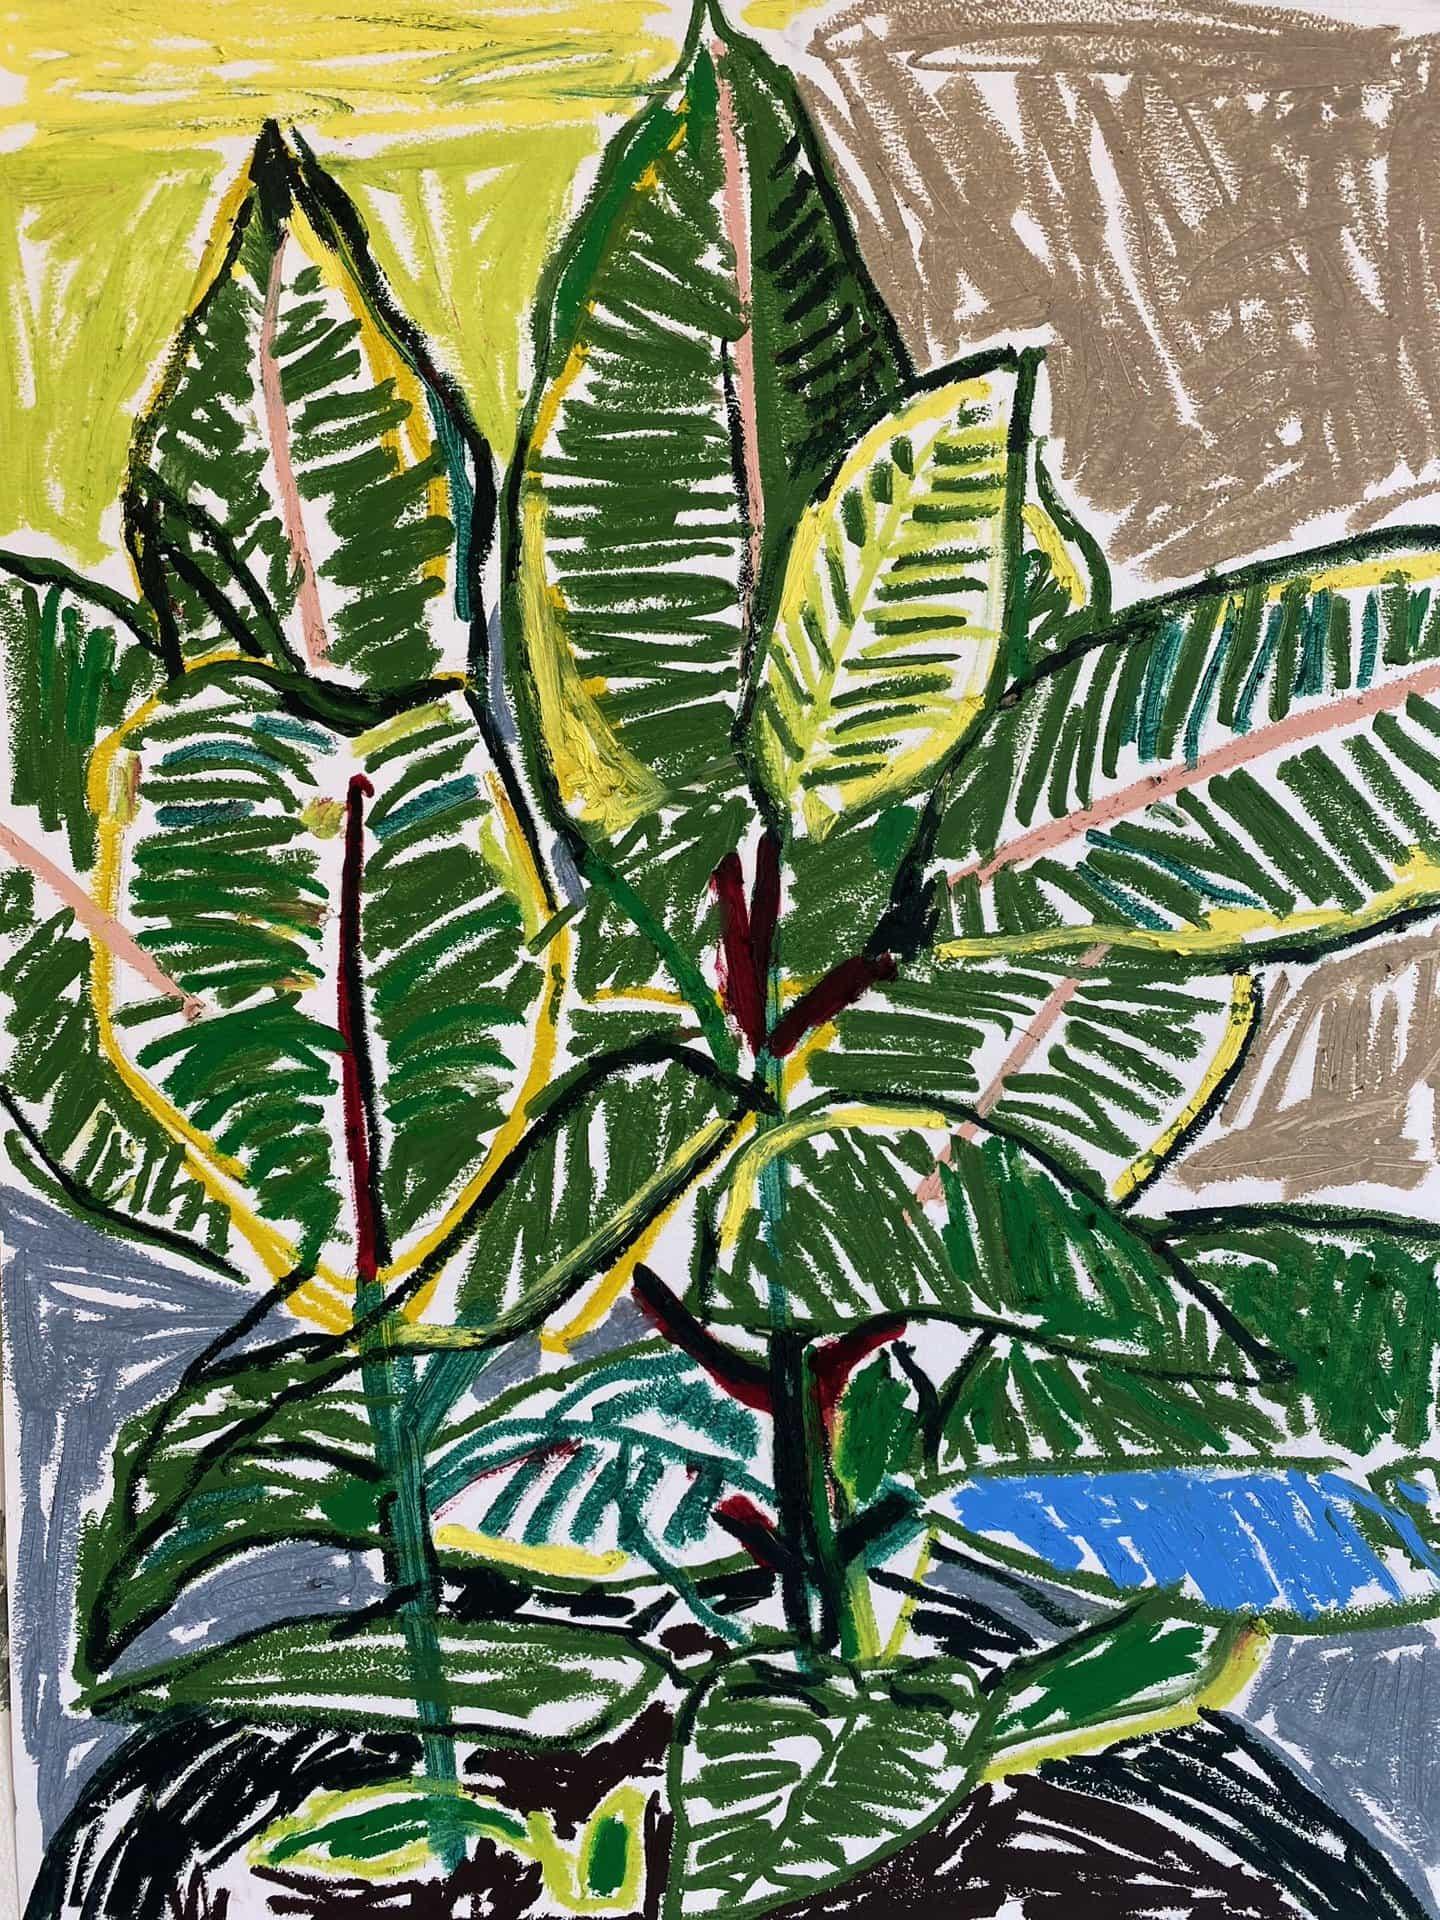 Paul Verdell: Planta de caucho (Copyright © Paul Verdell, 2020)